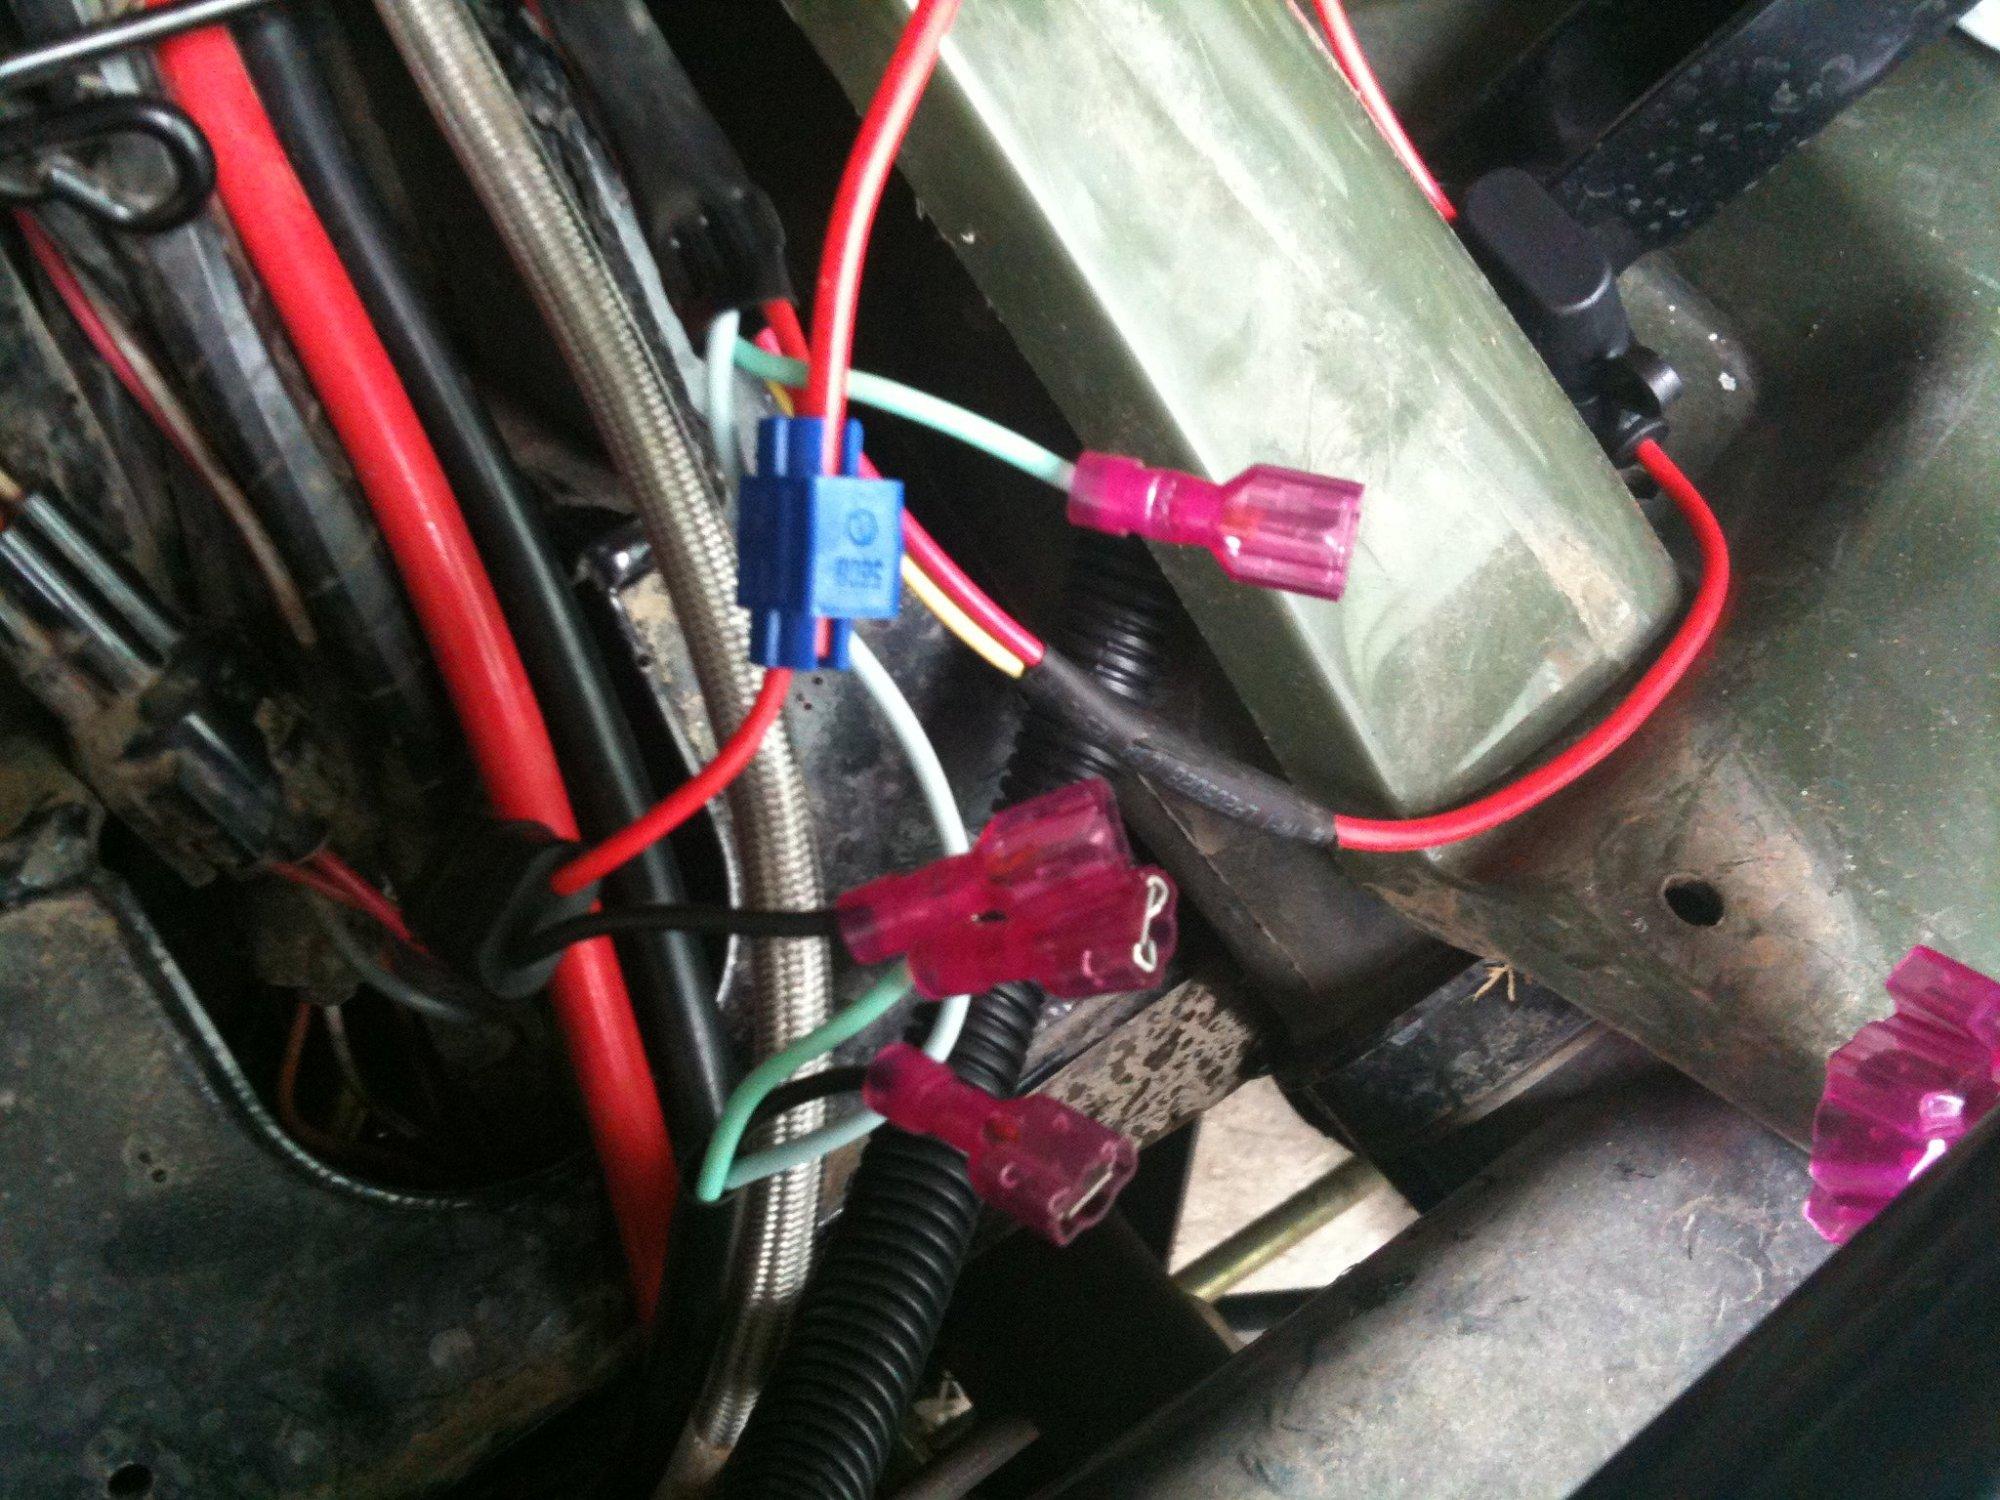 hight resolution of atv winch wiring harness wiring diagram warn atv winch wiring harness atv winch wiring harness